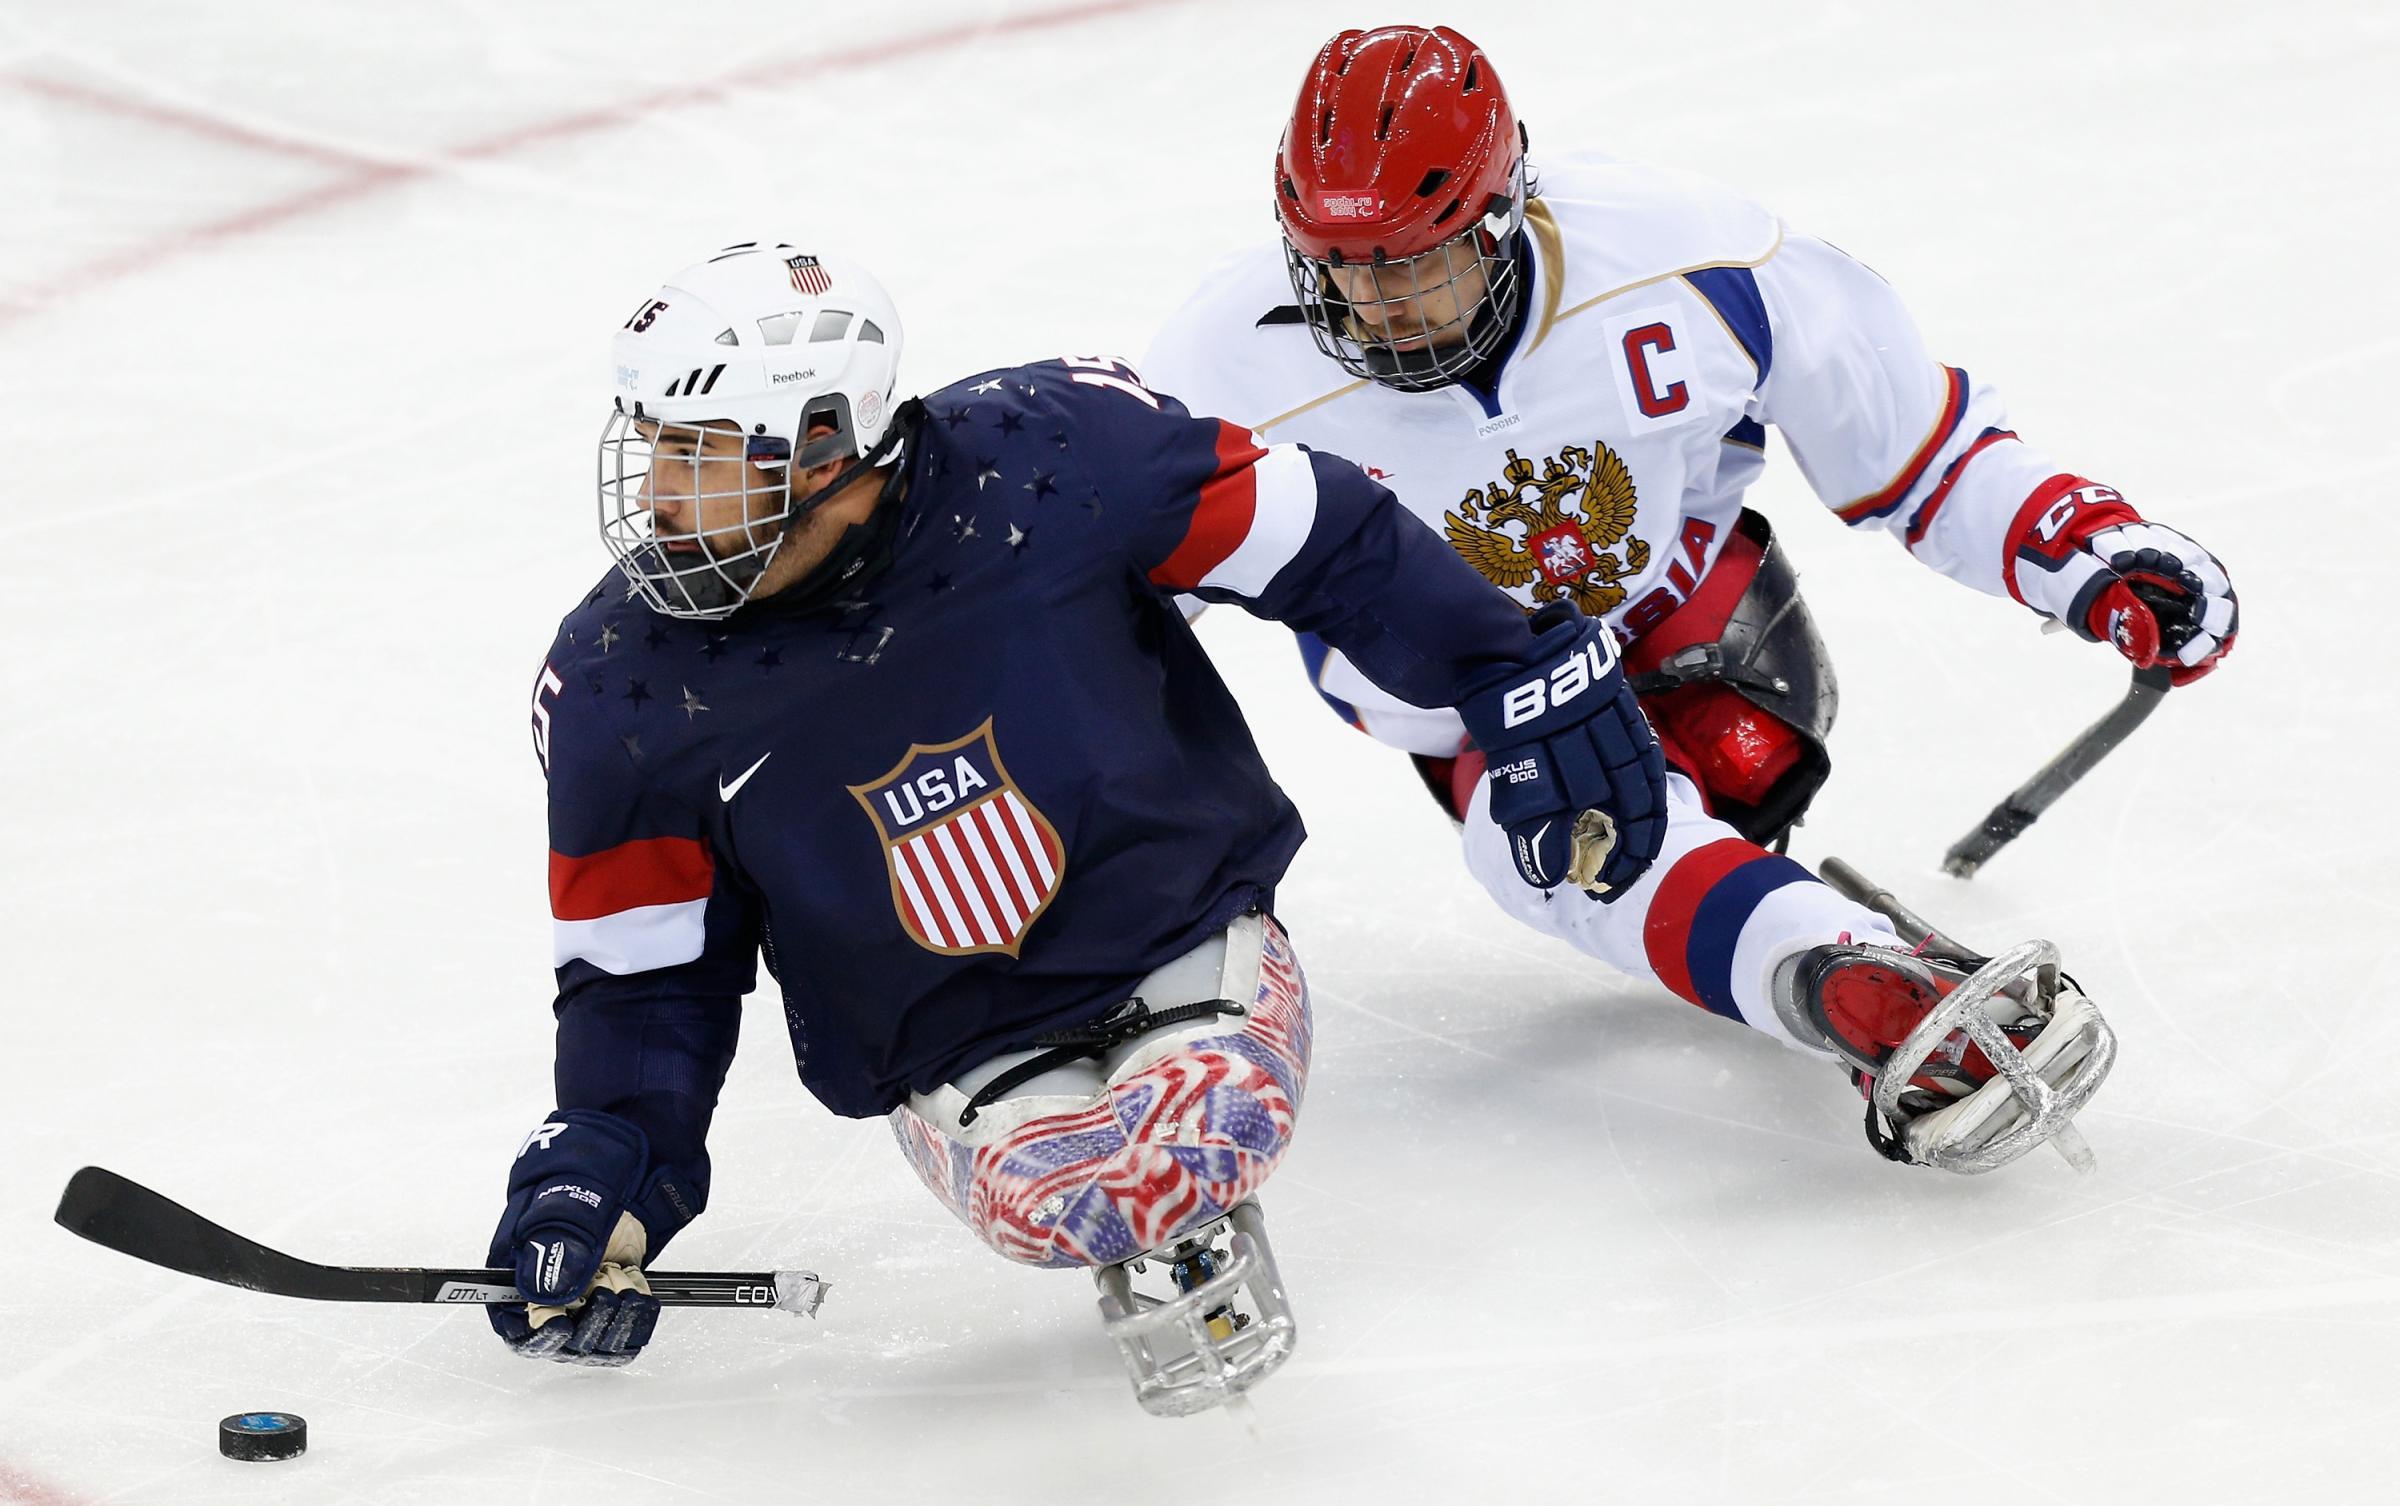 U.S. Beats Russia To Win Sled Hockey Gold At Sochi ...